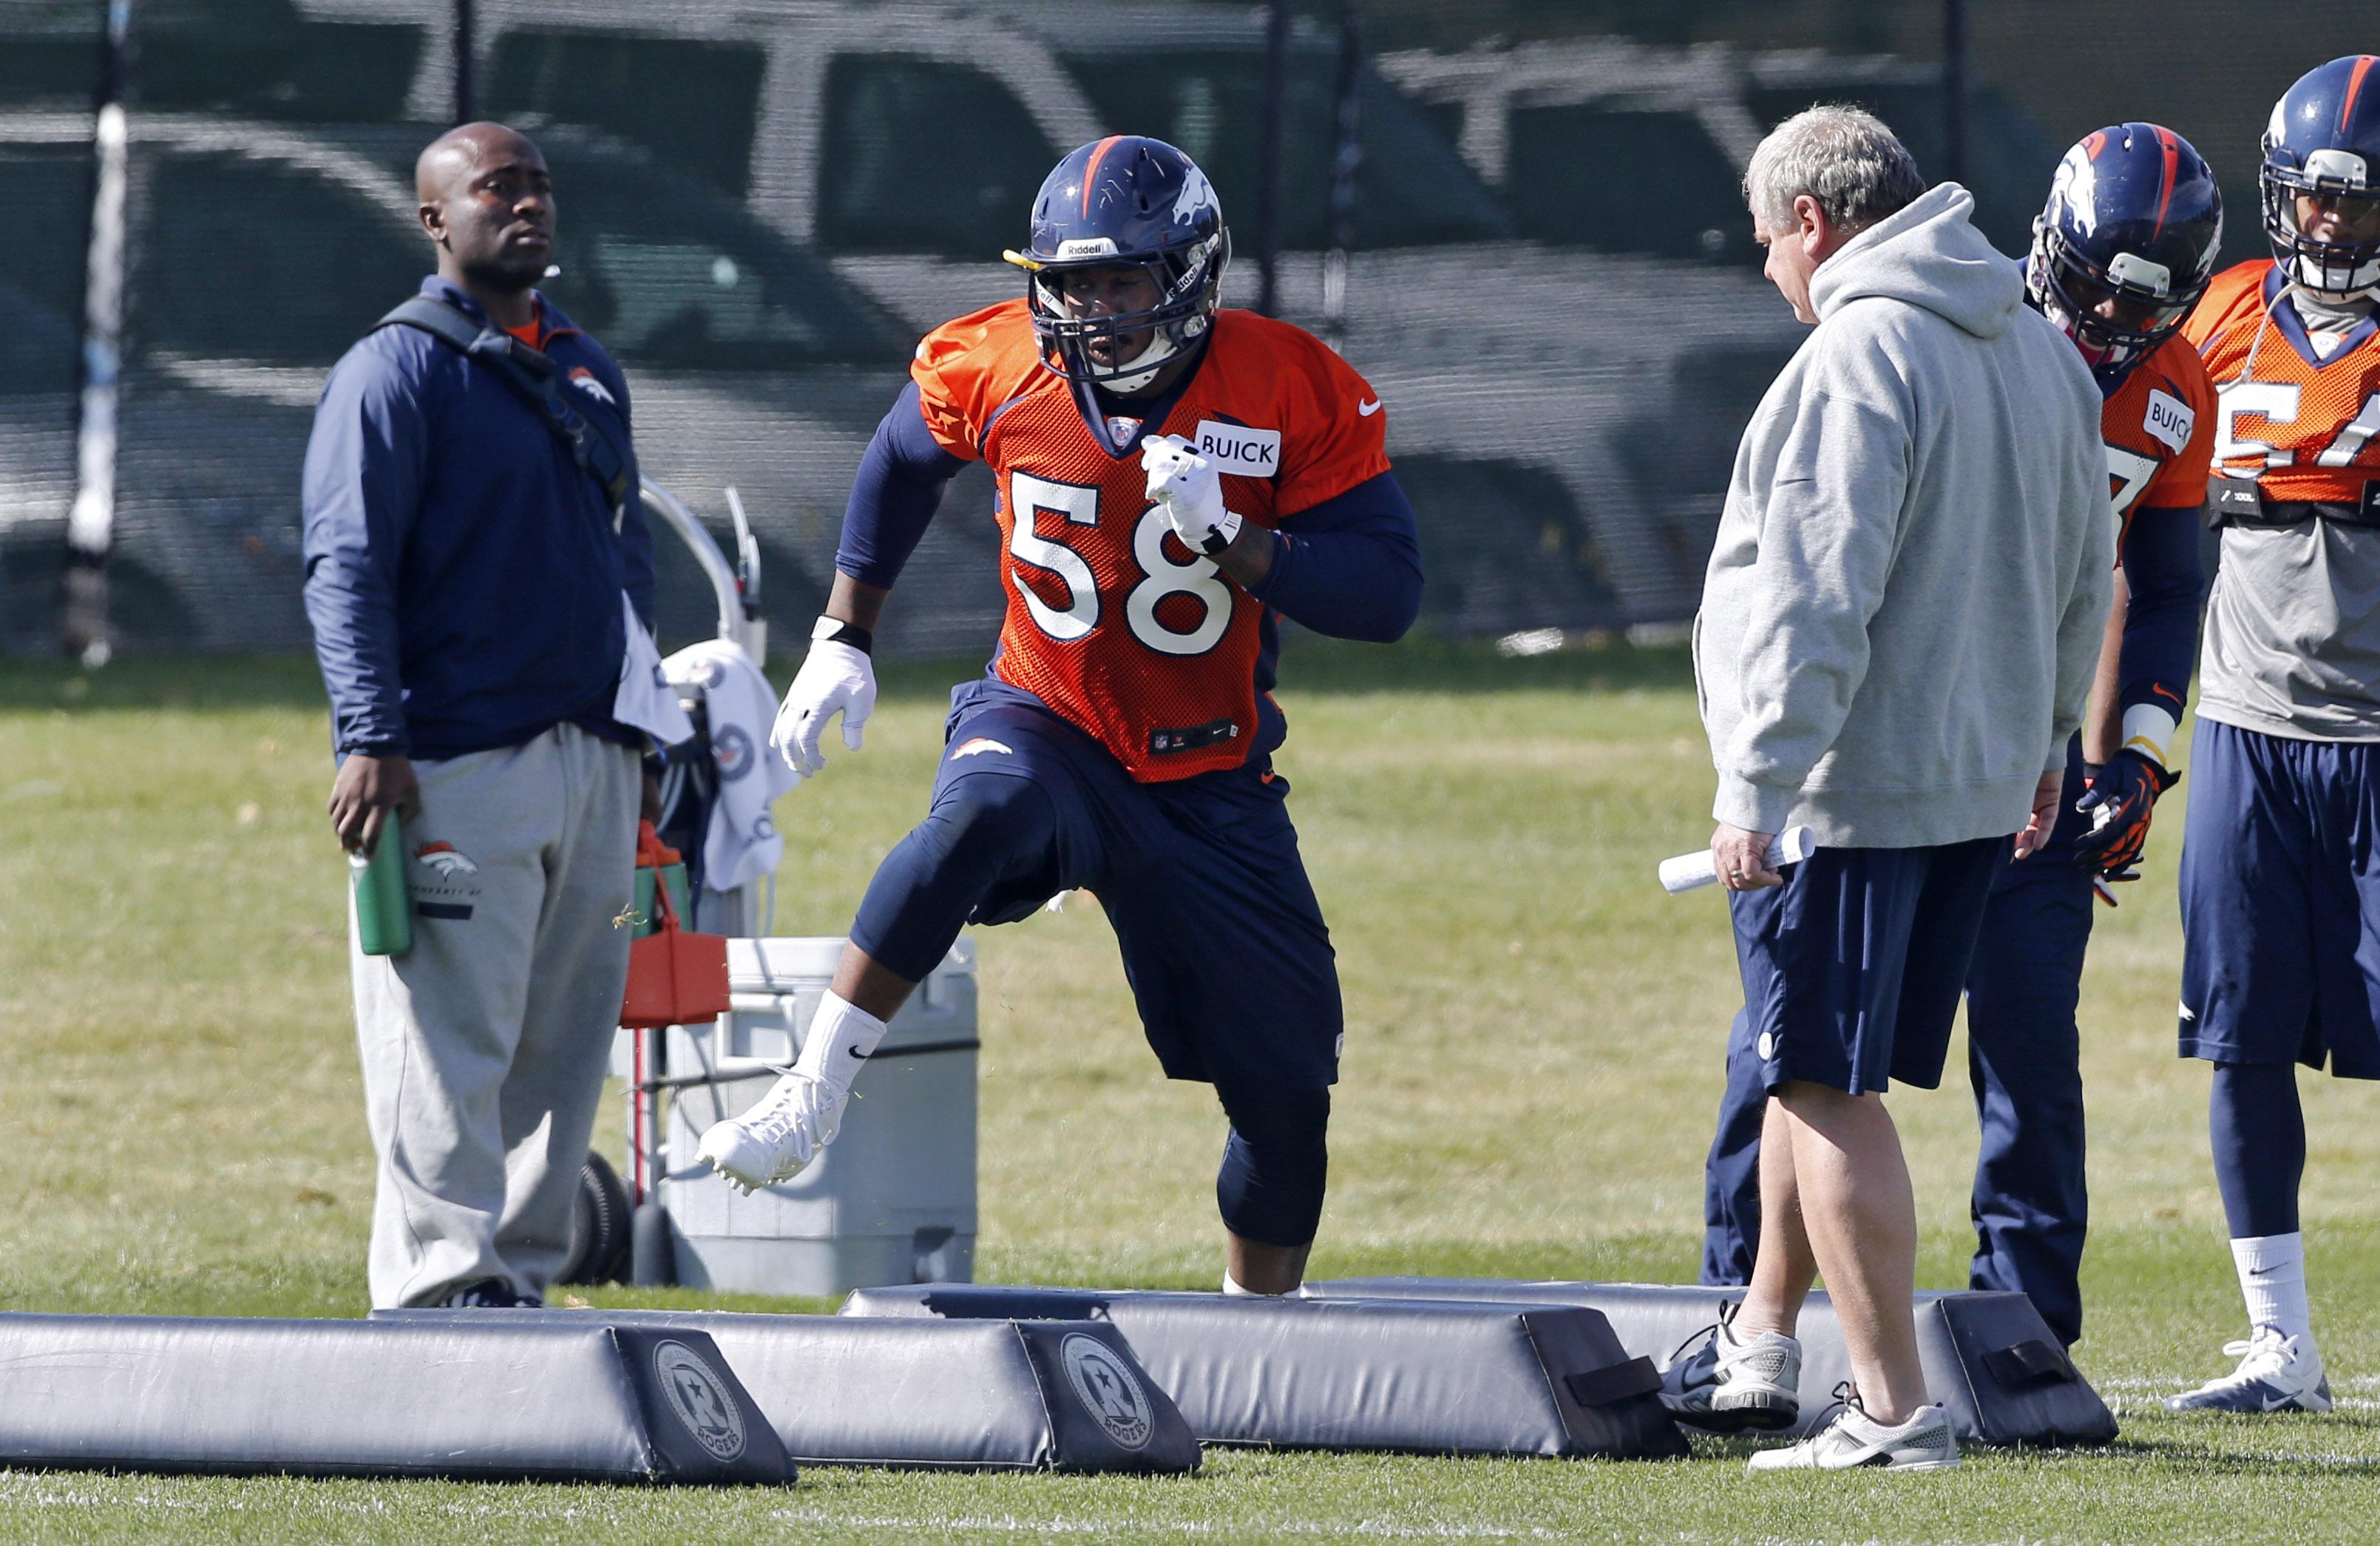 Broncos waive WR King to make room for Von Miller